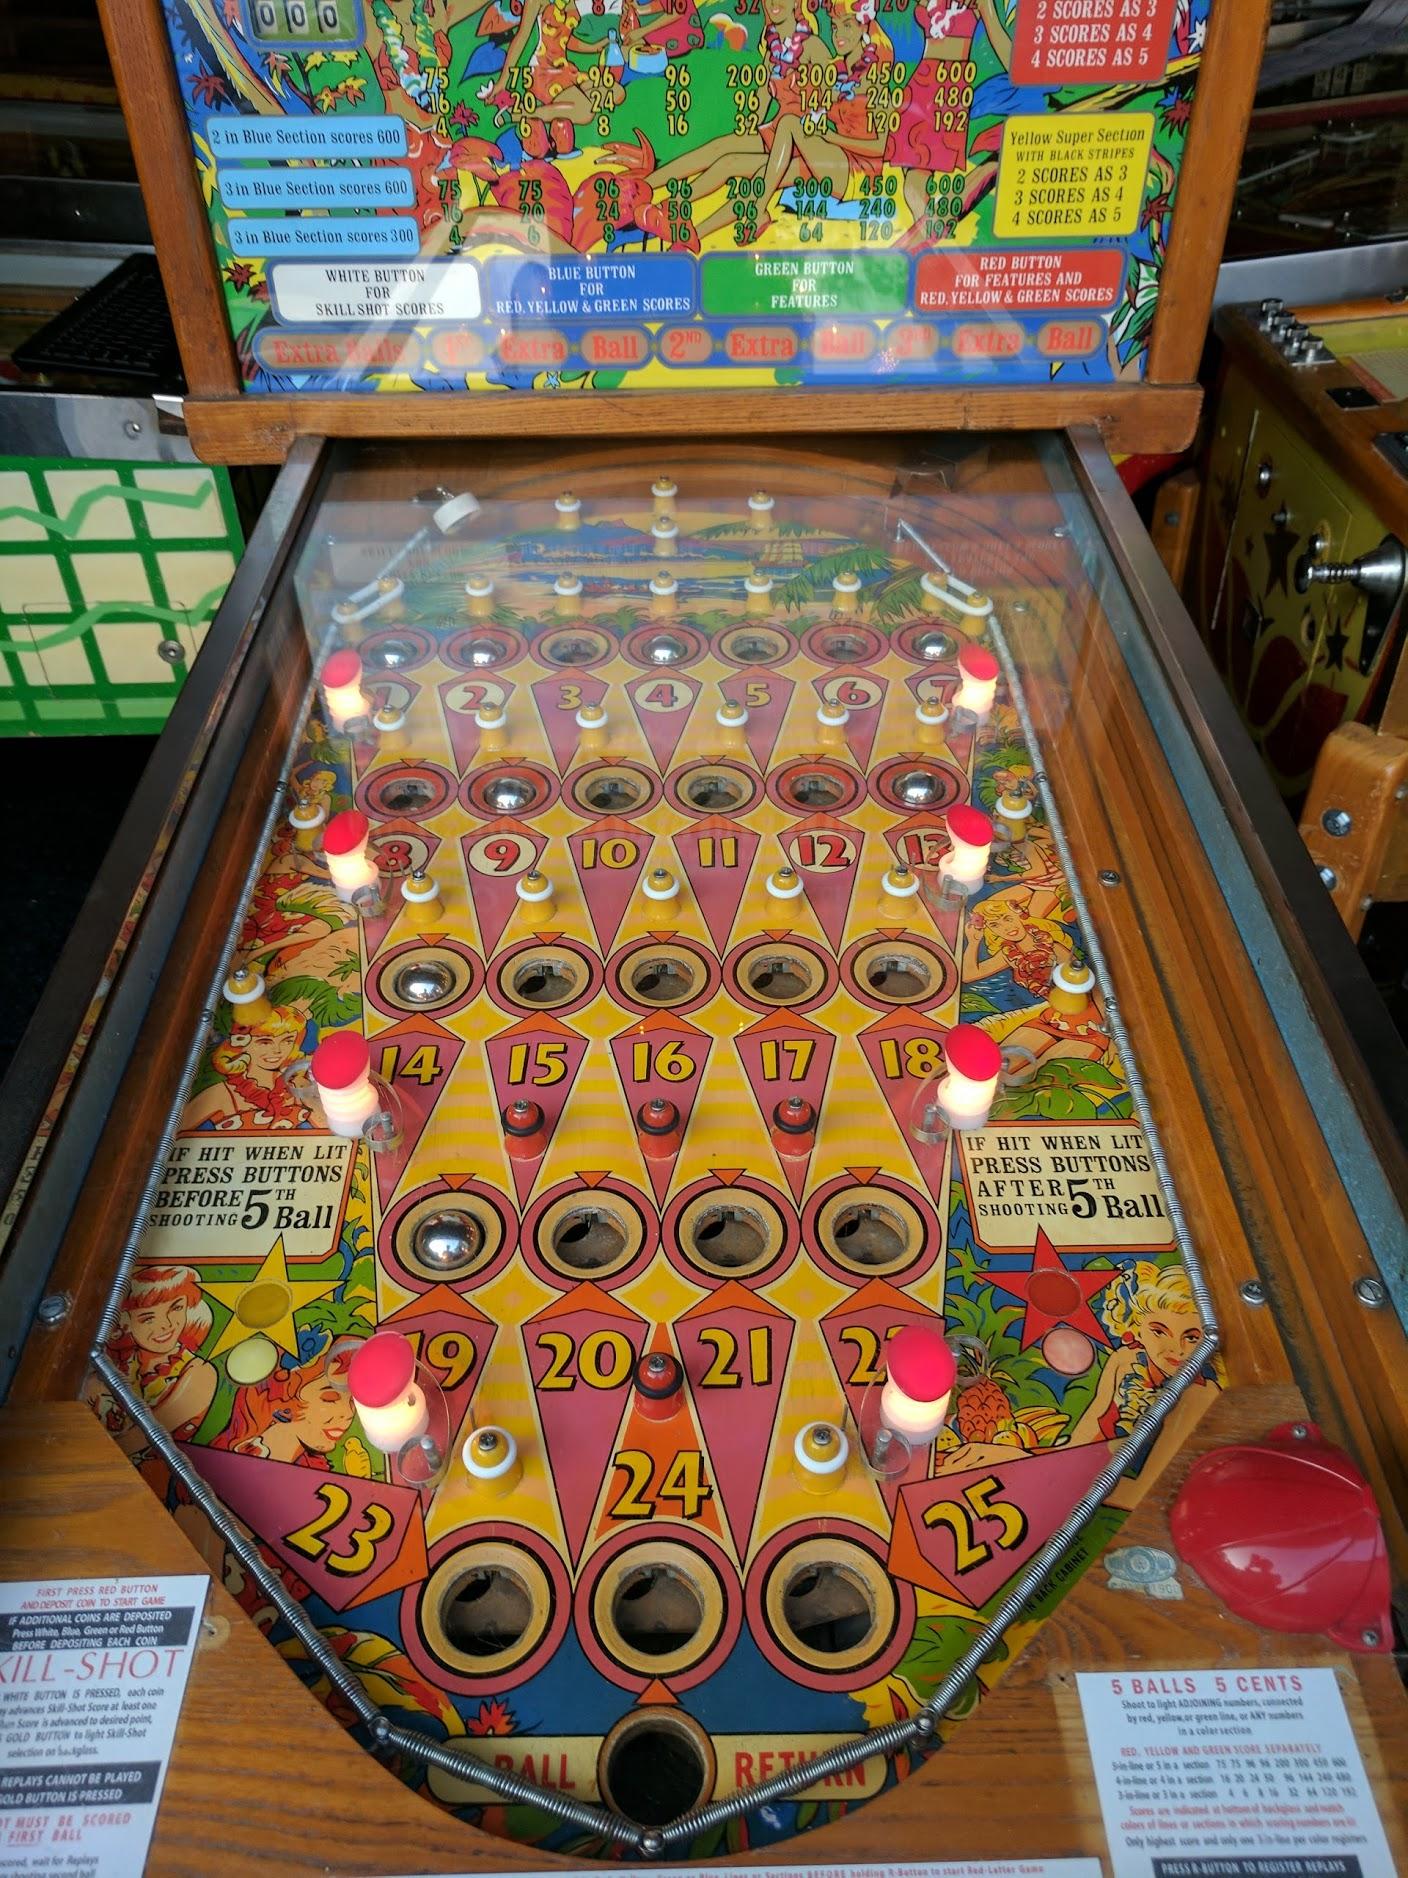 A Beginner's Guide to Bingo Pinball - by Nick Baldridge - This Week